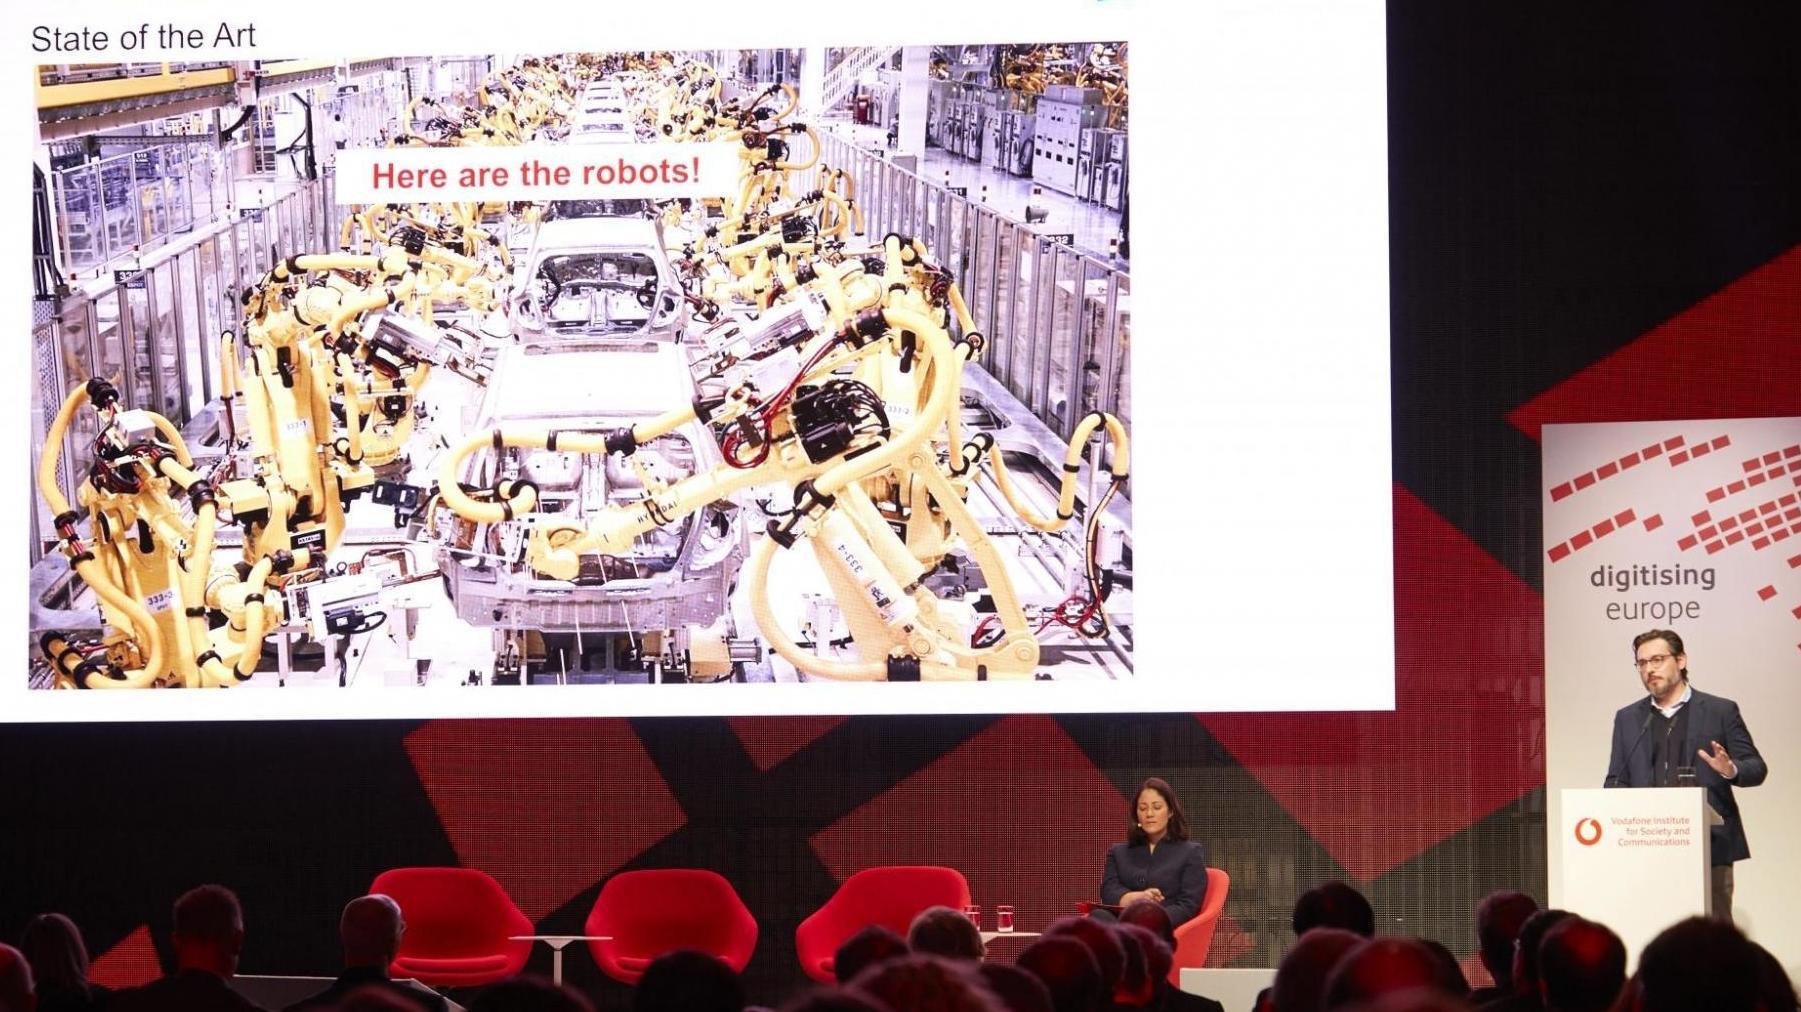 Digital-Gipfel des Vodafone-Instituts